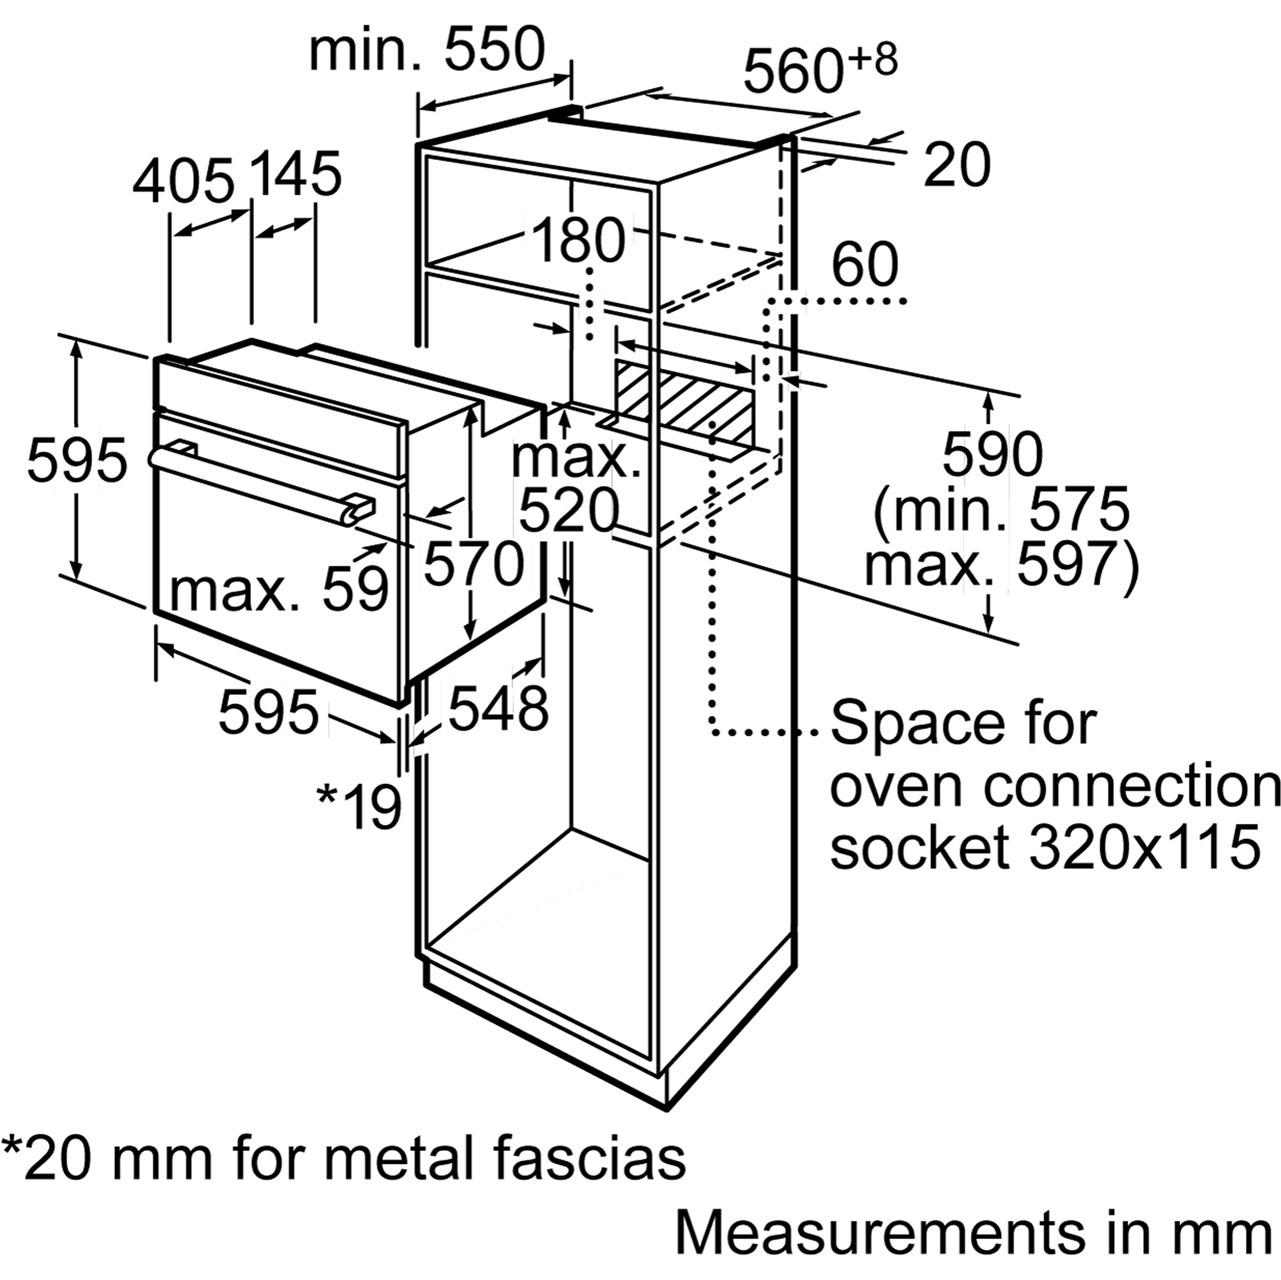 hbn331e4b_ss_bosch_singleovens_01_dim_l?resize\\\\\\\=665%2C664 ez wiring mini 20 diagram ez wiring diagrams ez wiring mini 20 wiring diagram download at gsmx.co